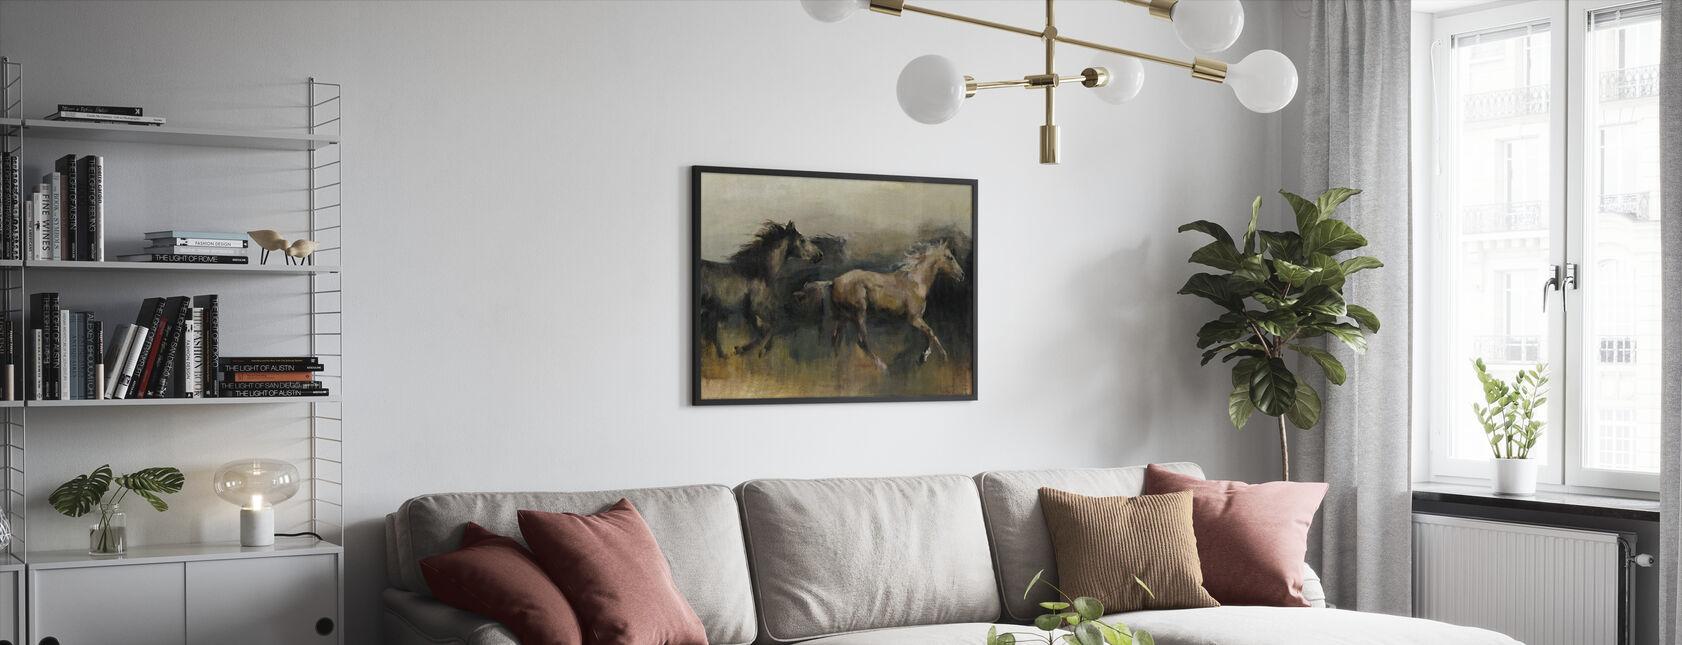 Roaming i väst - Inramad tavla - Vardagsrum